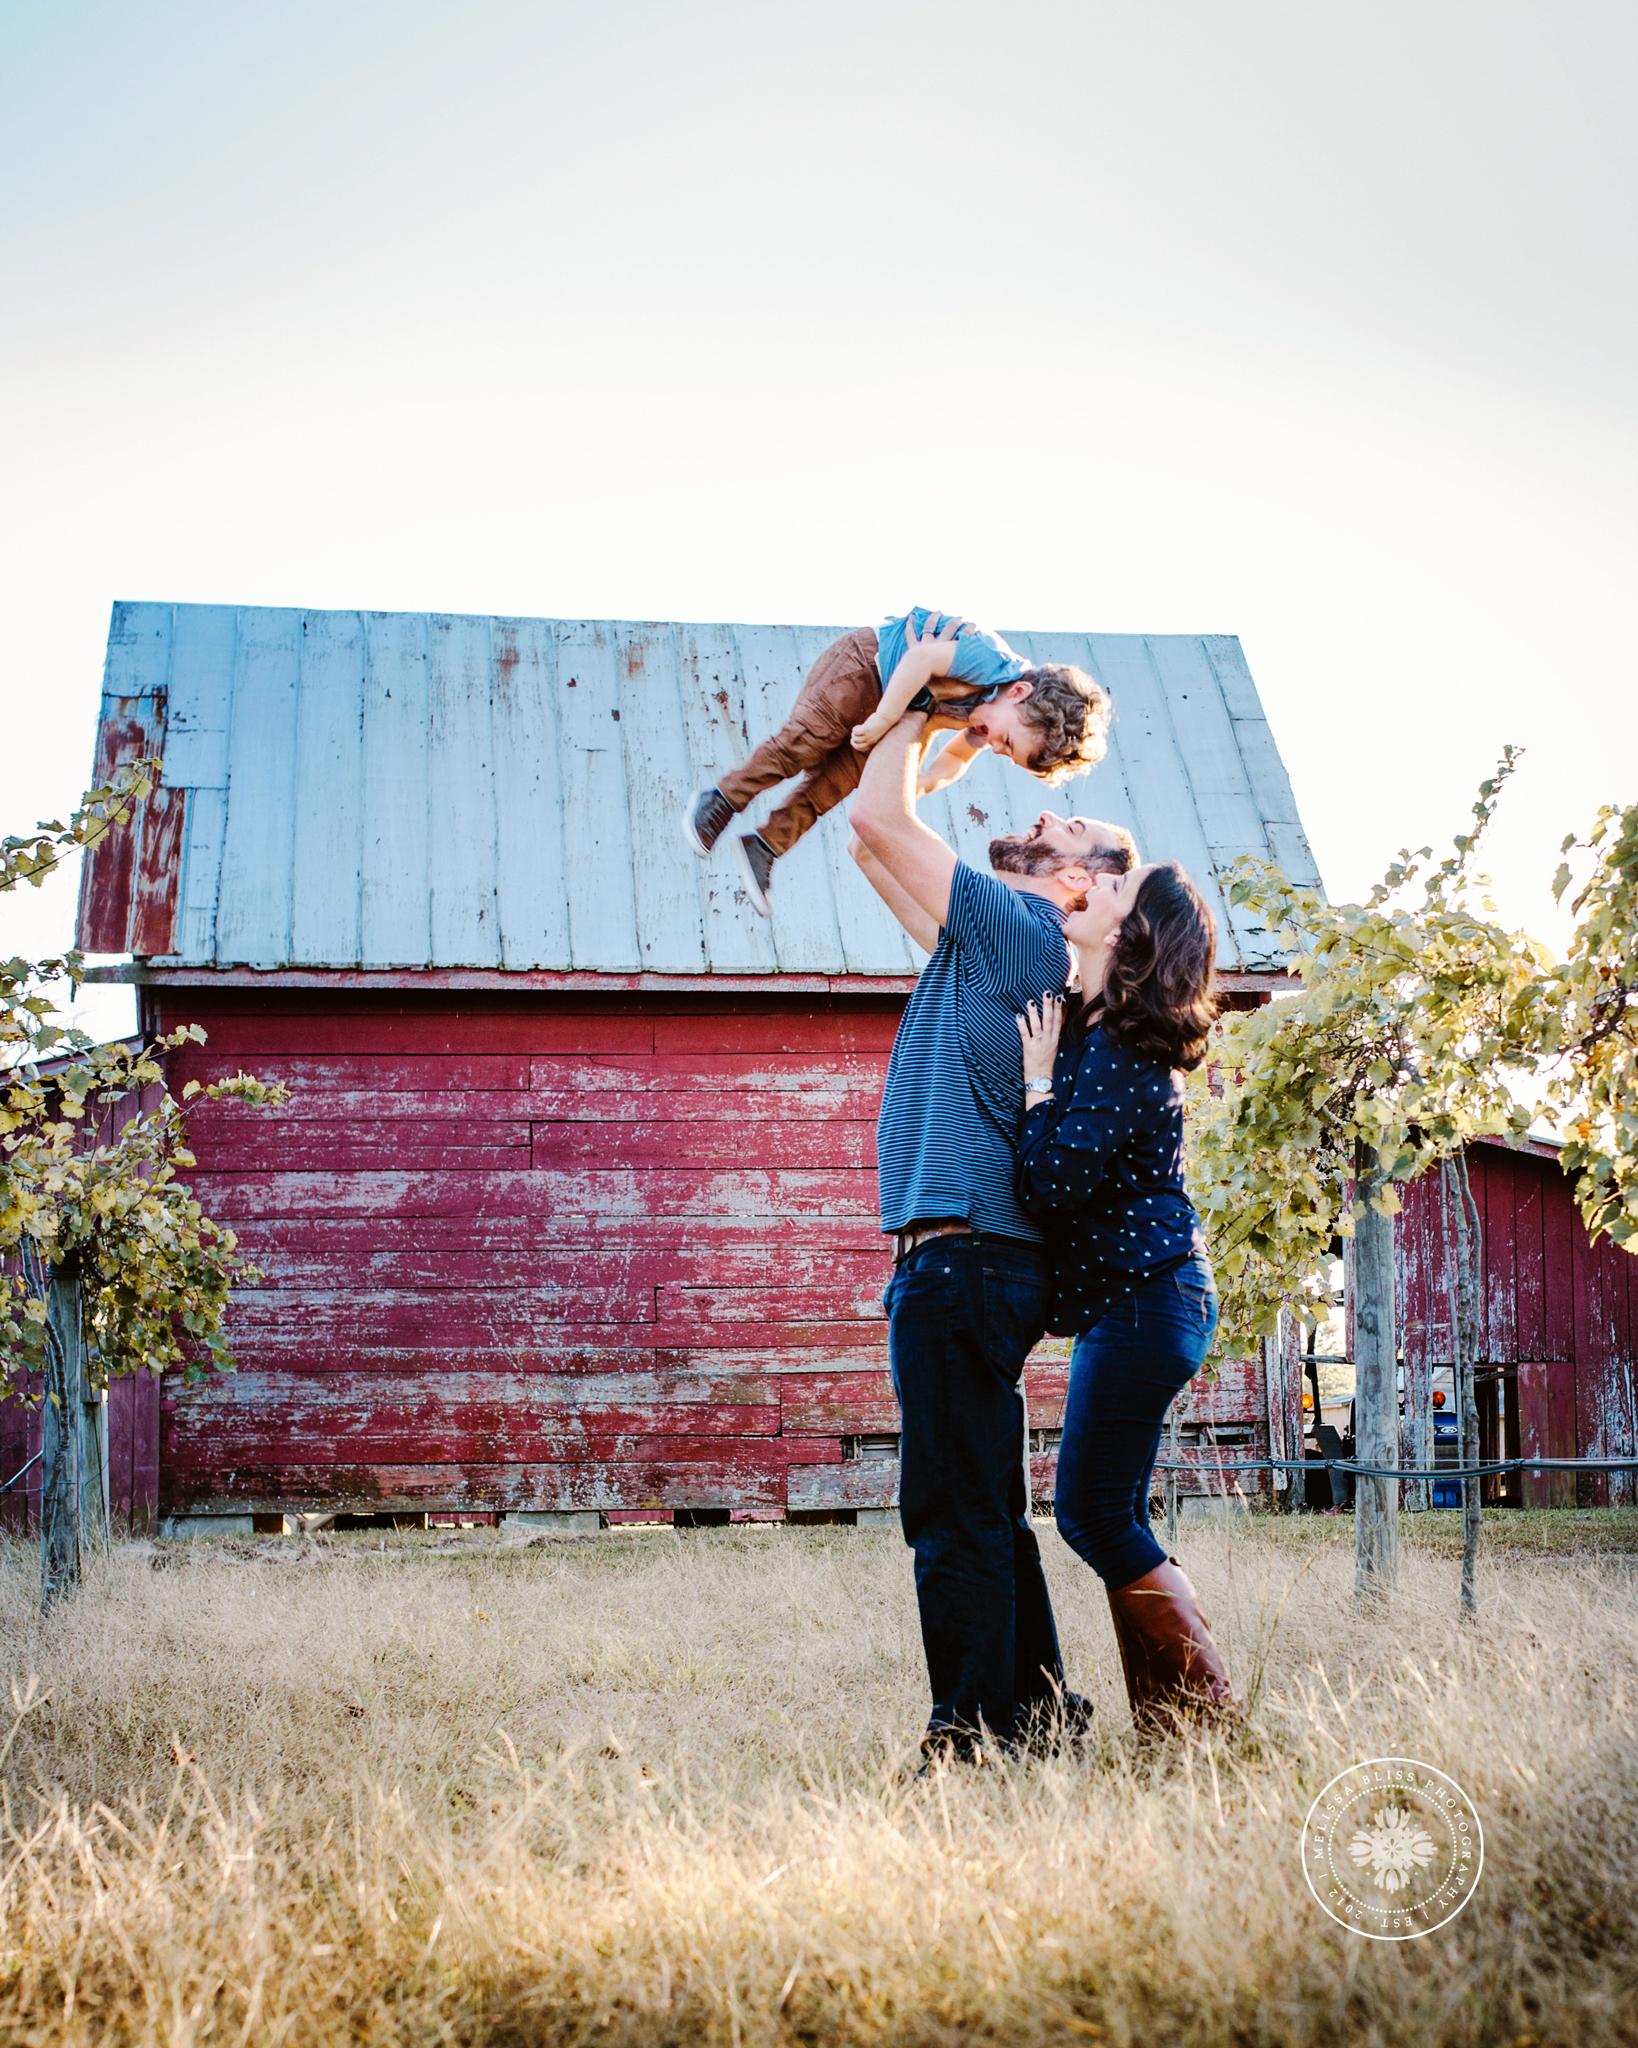 norfolk-family-photographers-virginia-beach-chesapeake-family-photographer-melissa-bliss-photography-williamsburg-lifestyle-photographer-hampton-roads-family-photographer